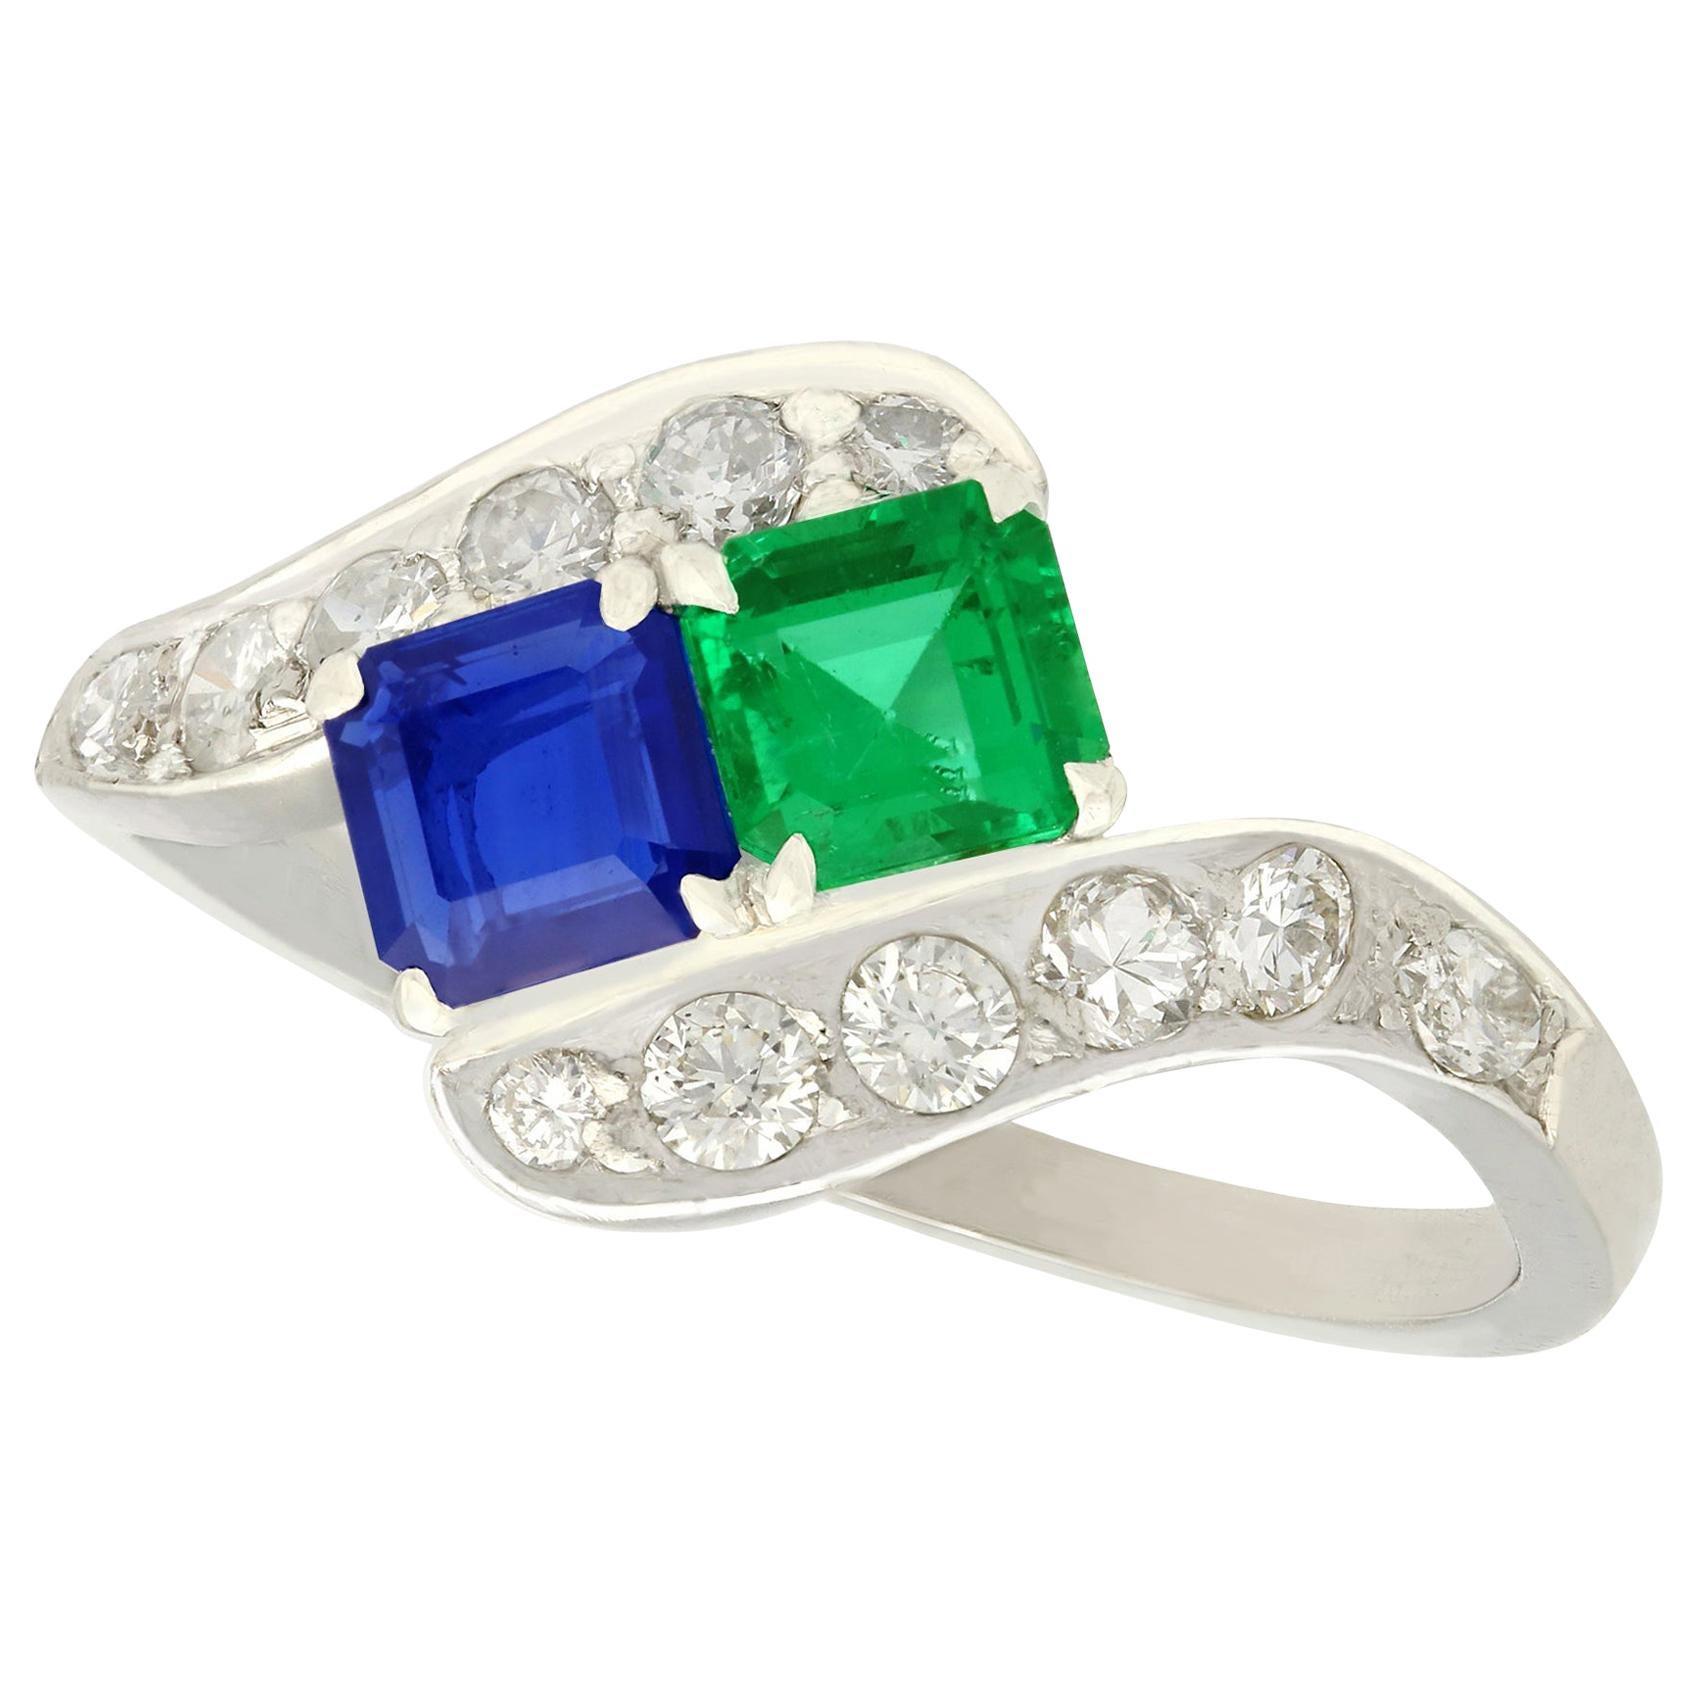 Vintage 1950s Sapphire and Emerald Diamond and Platinum Twist Ring